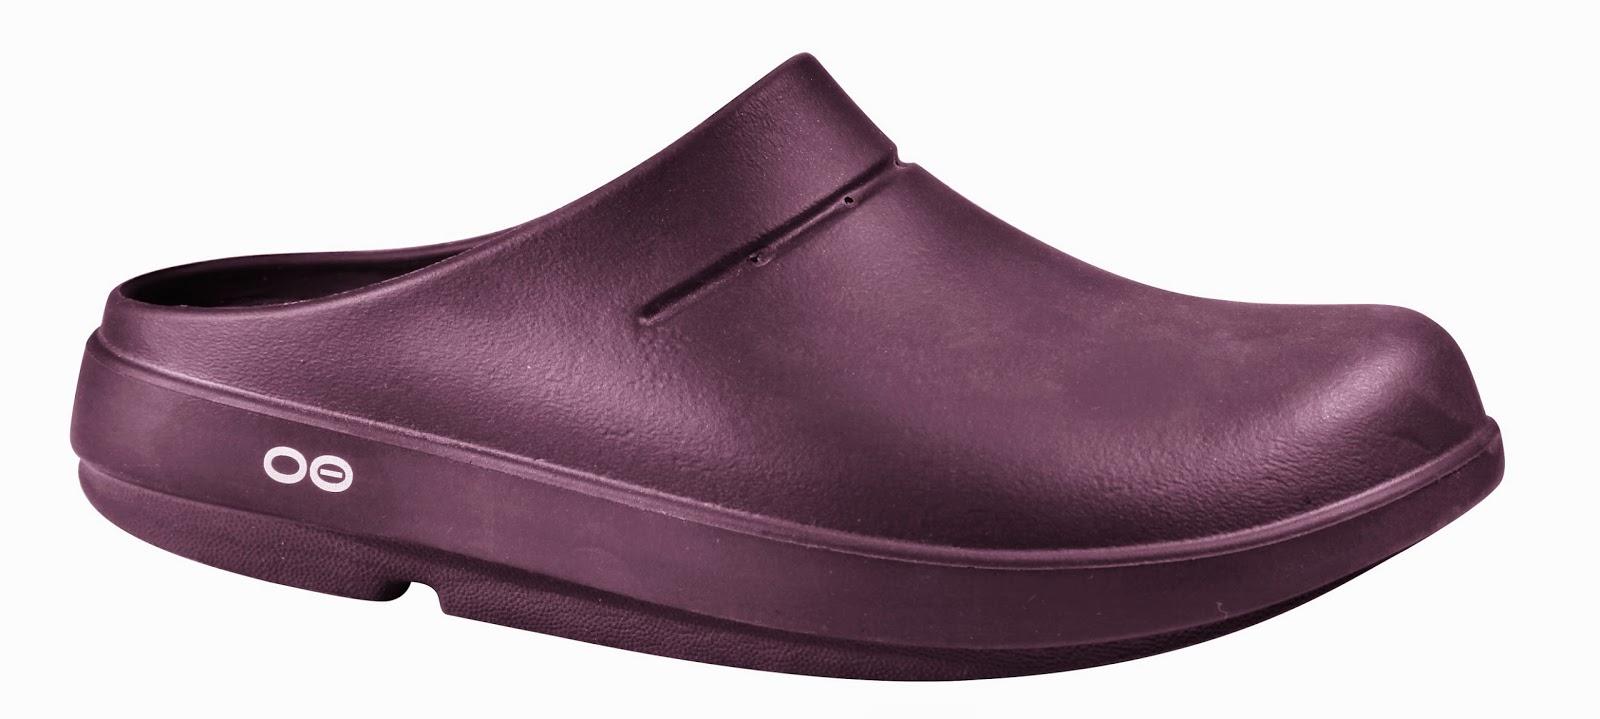 Womens sandals reviews - Oocloogs